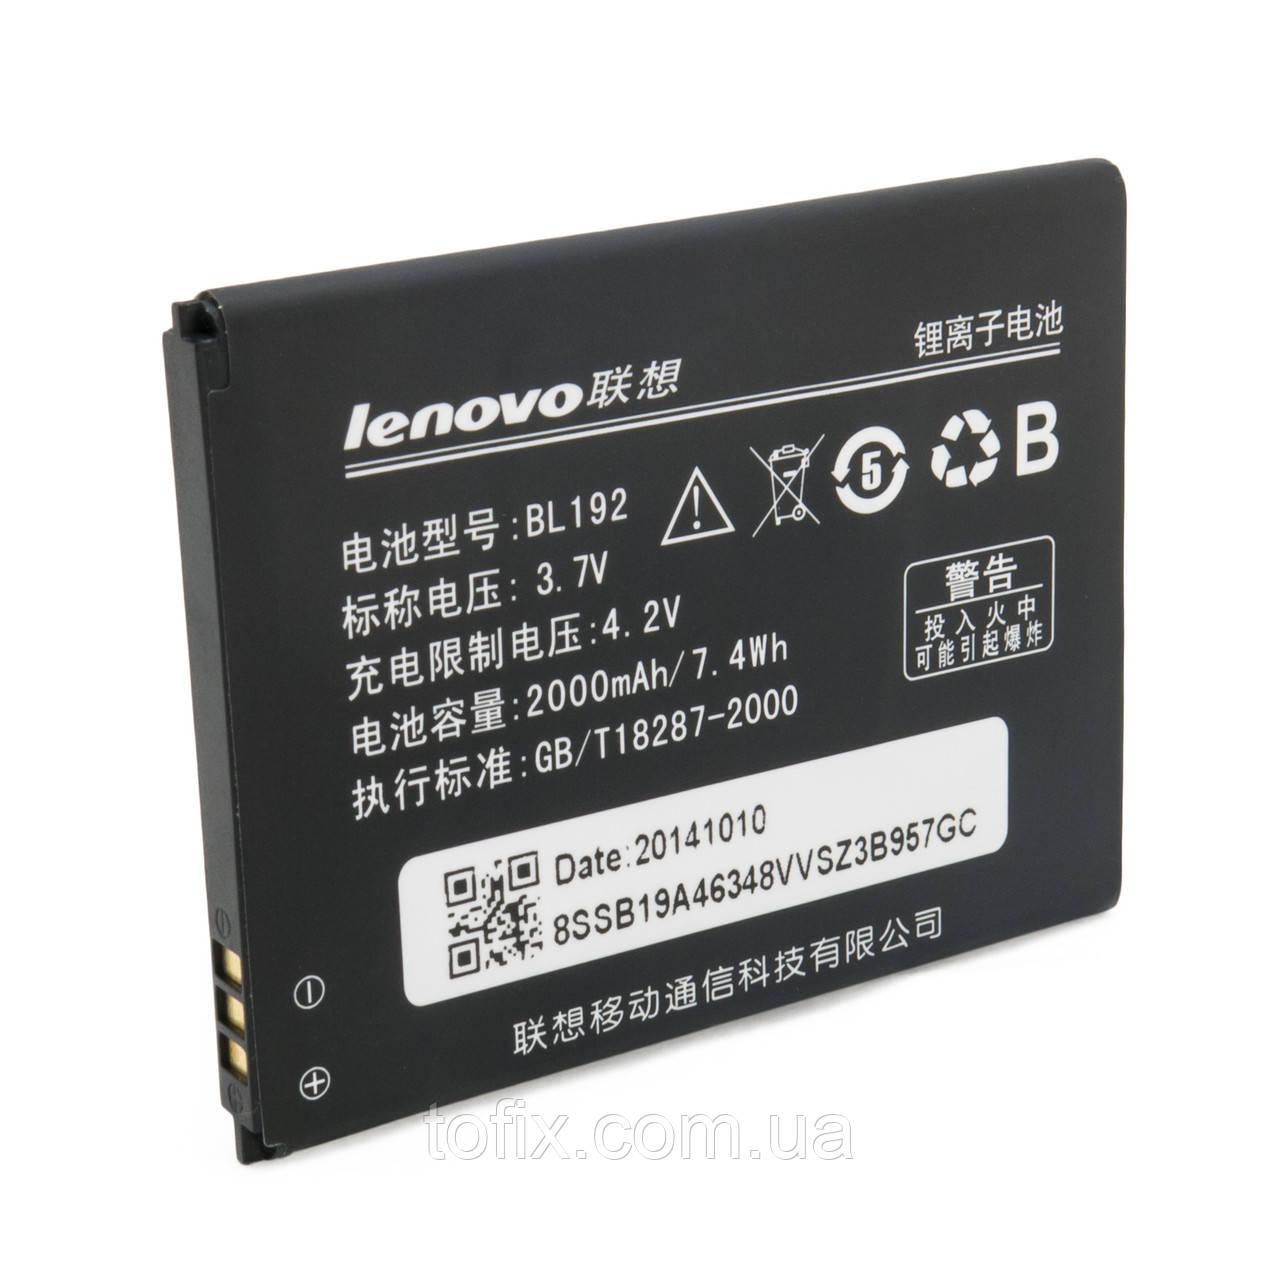 Батарея (акб, аккумулятор) BL192 для Lenovo A388T IdeaPhone, 2000 mAh, оригинал